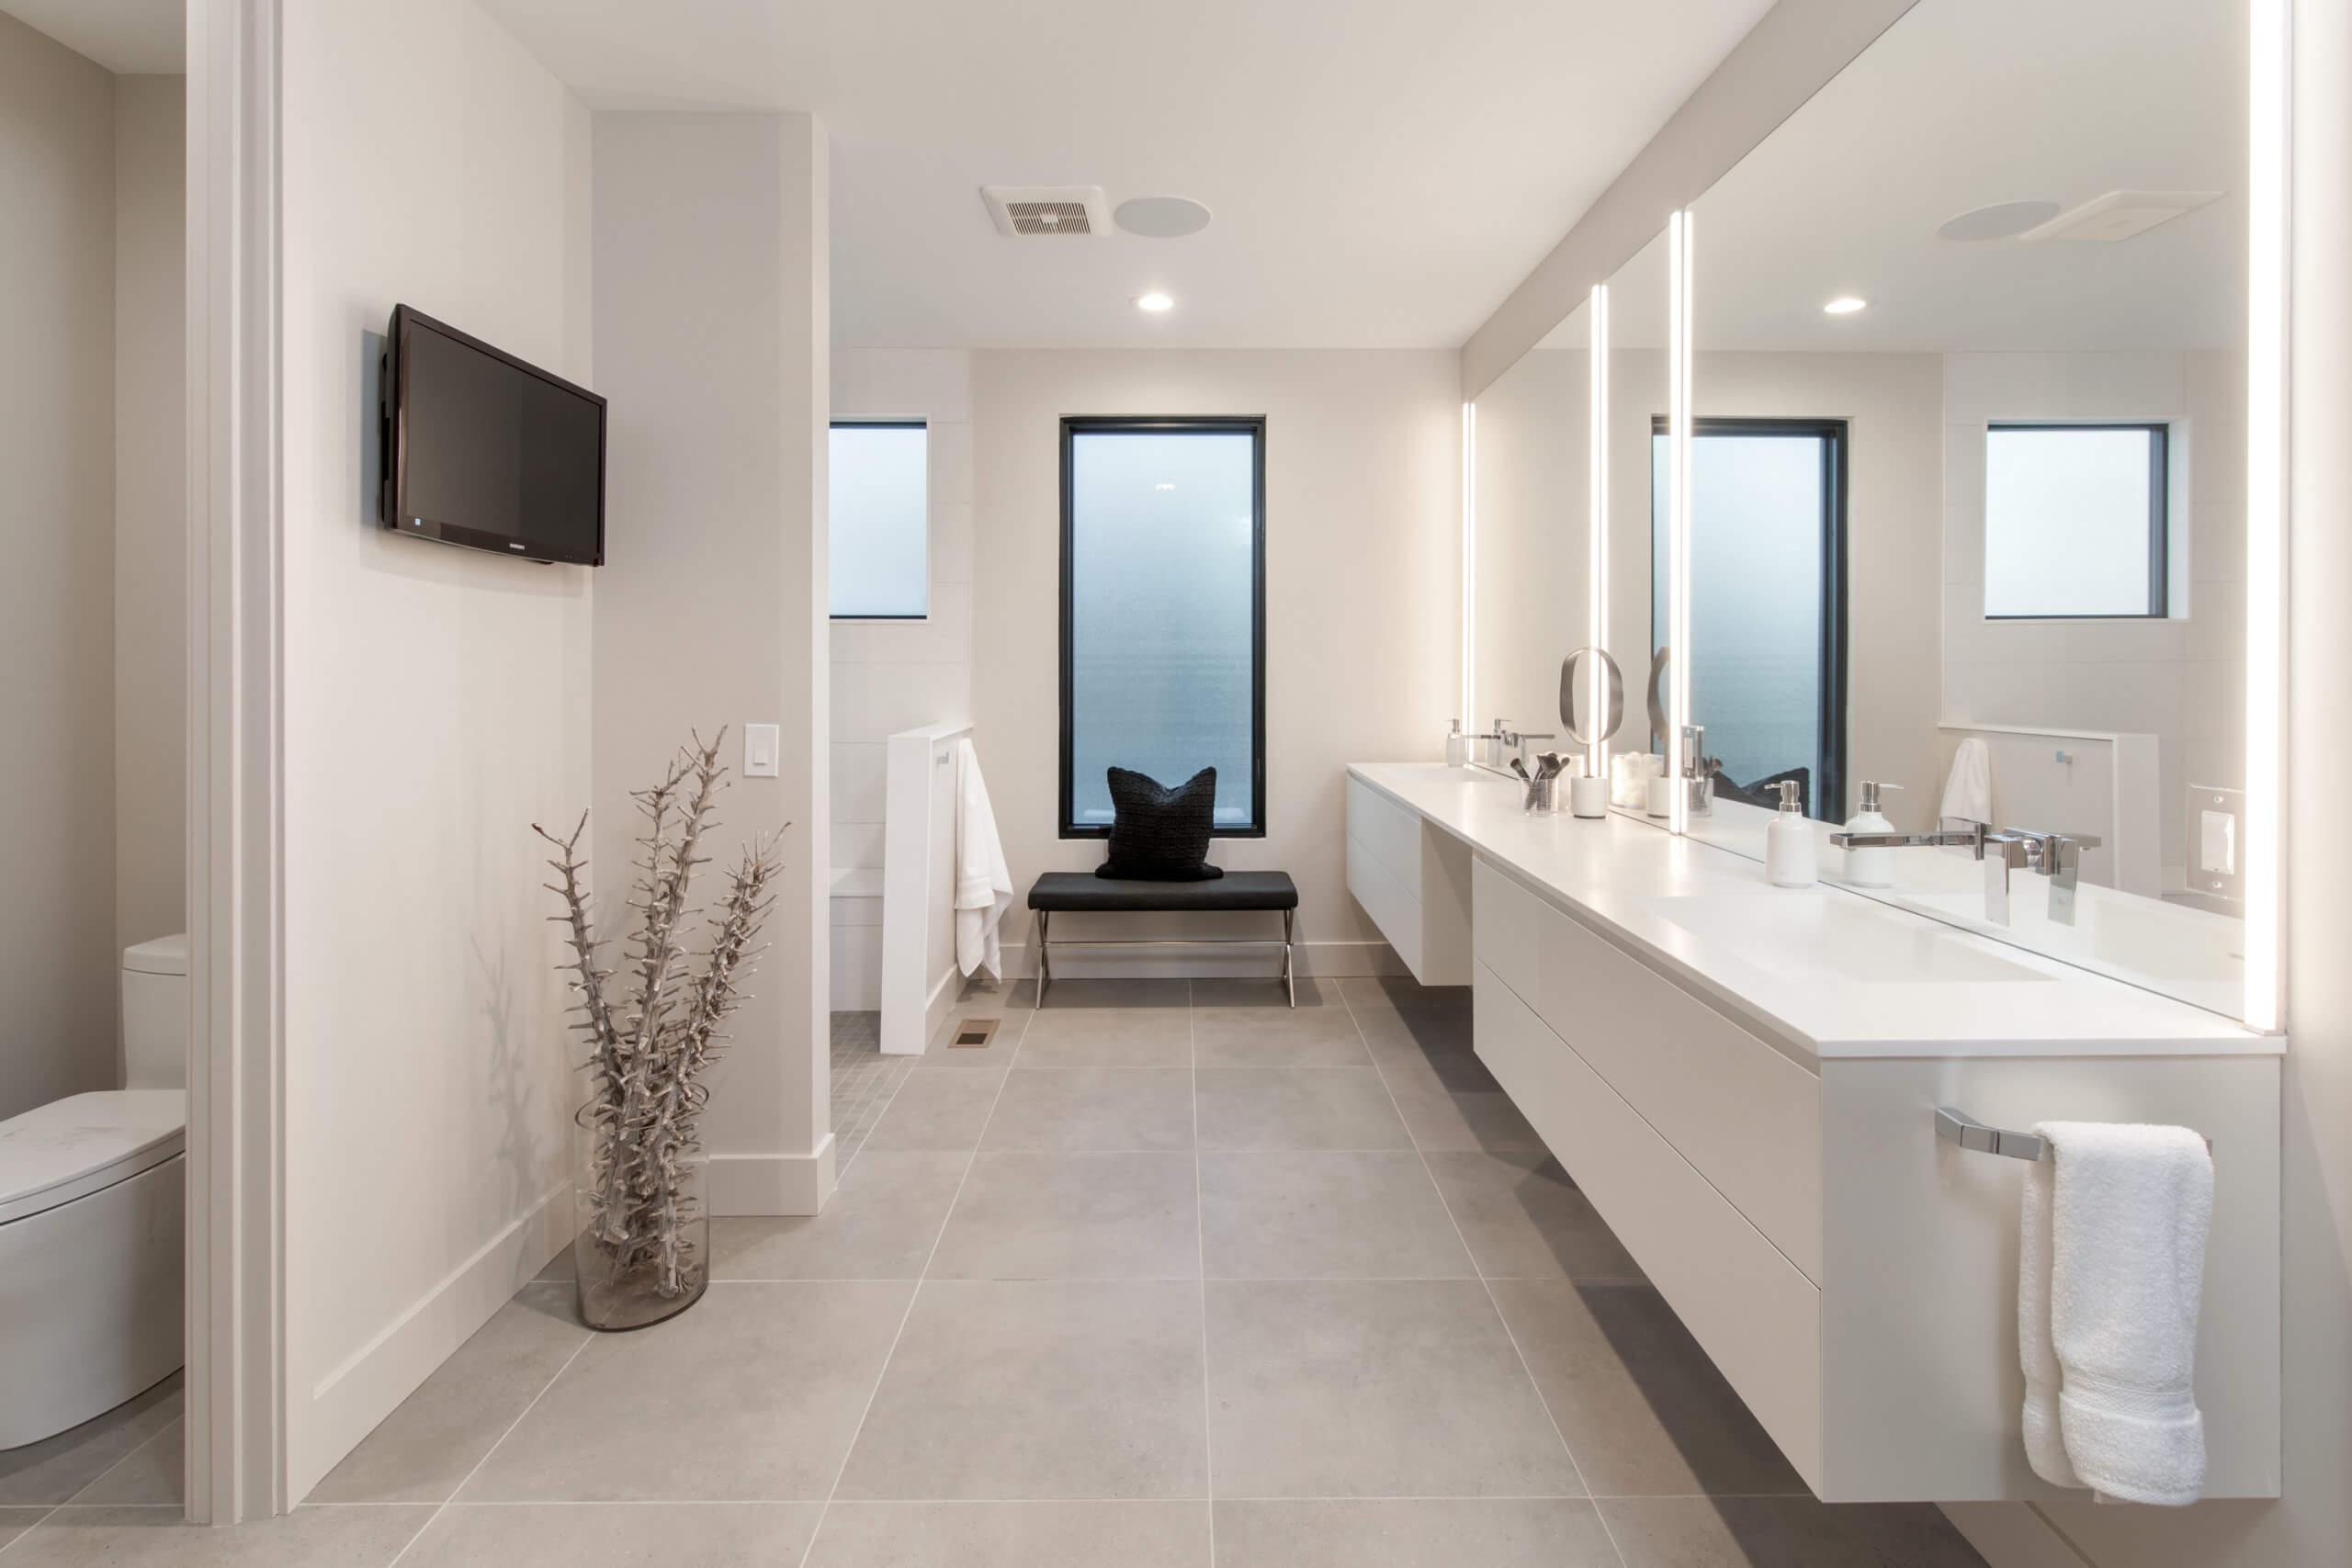 All white custom modern bathroom with custom white vanity. Bathroom designed by Cincinnati's premiere interior designer, Renan Menninger of RM Interiors.